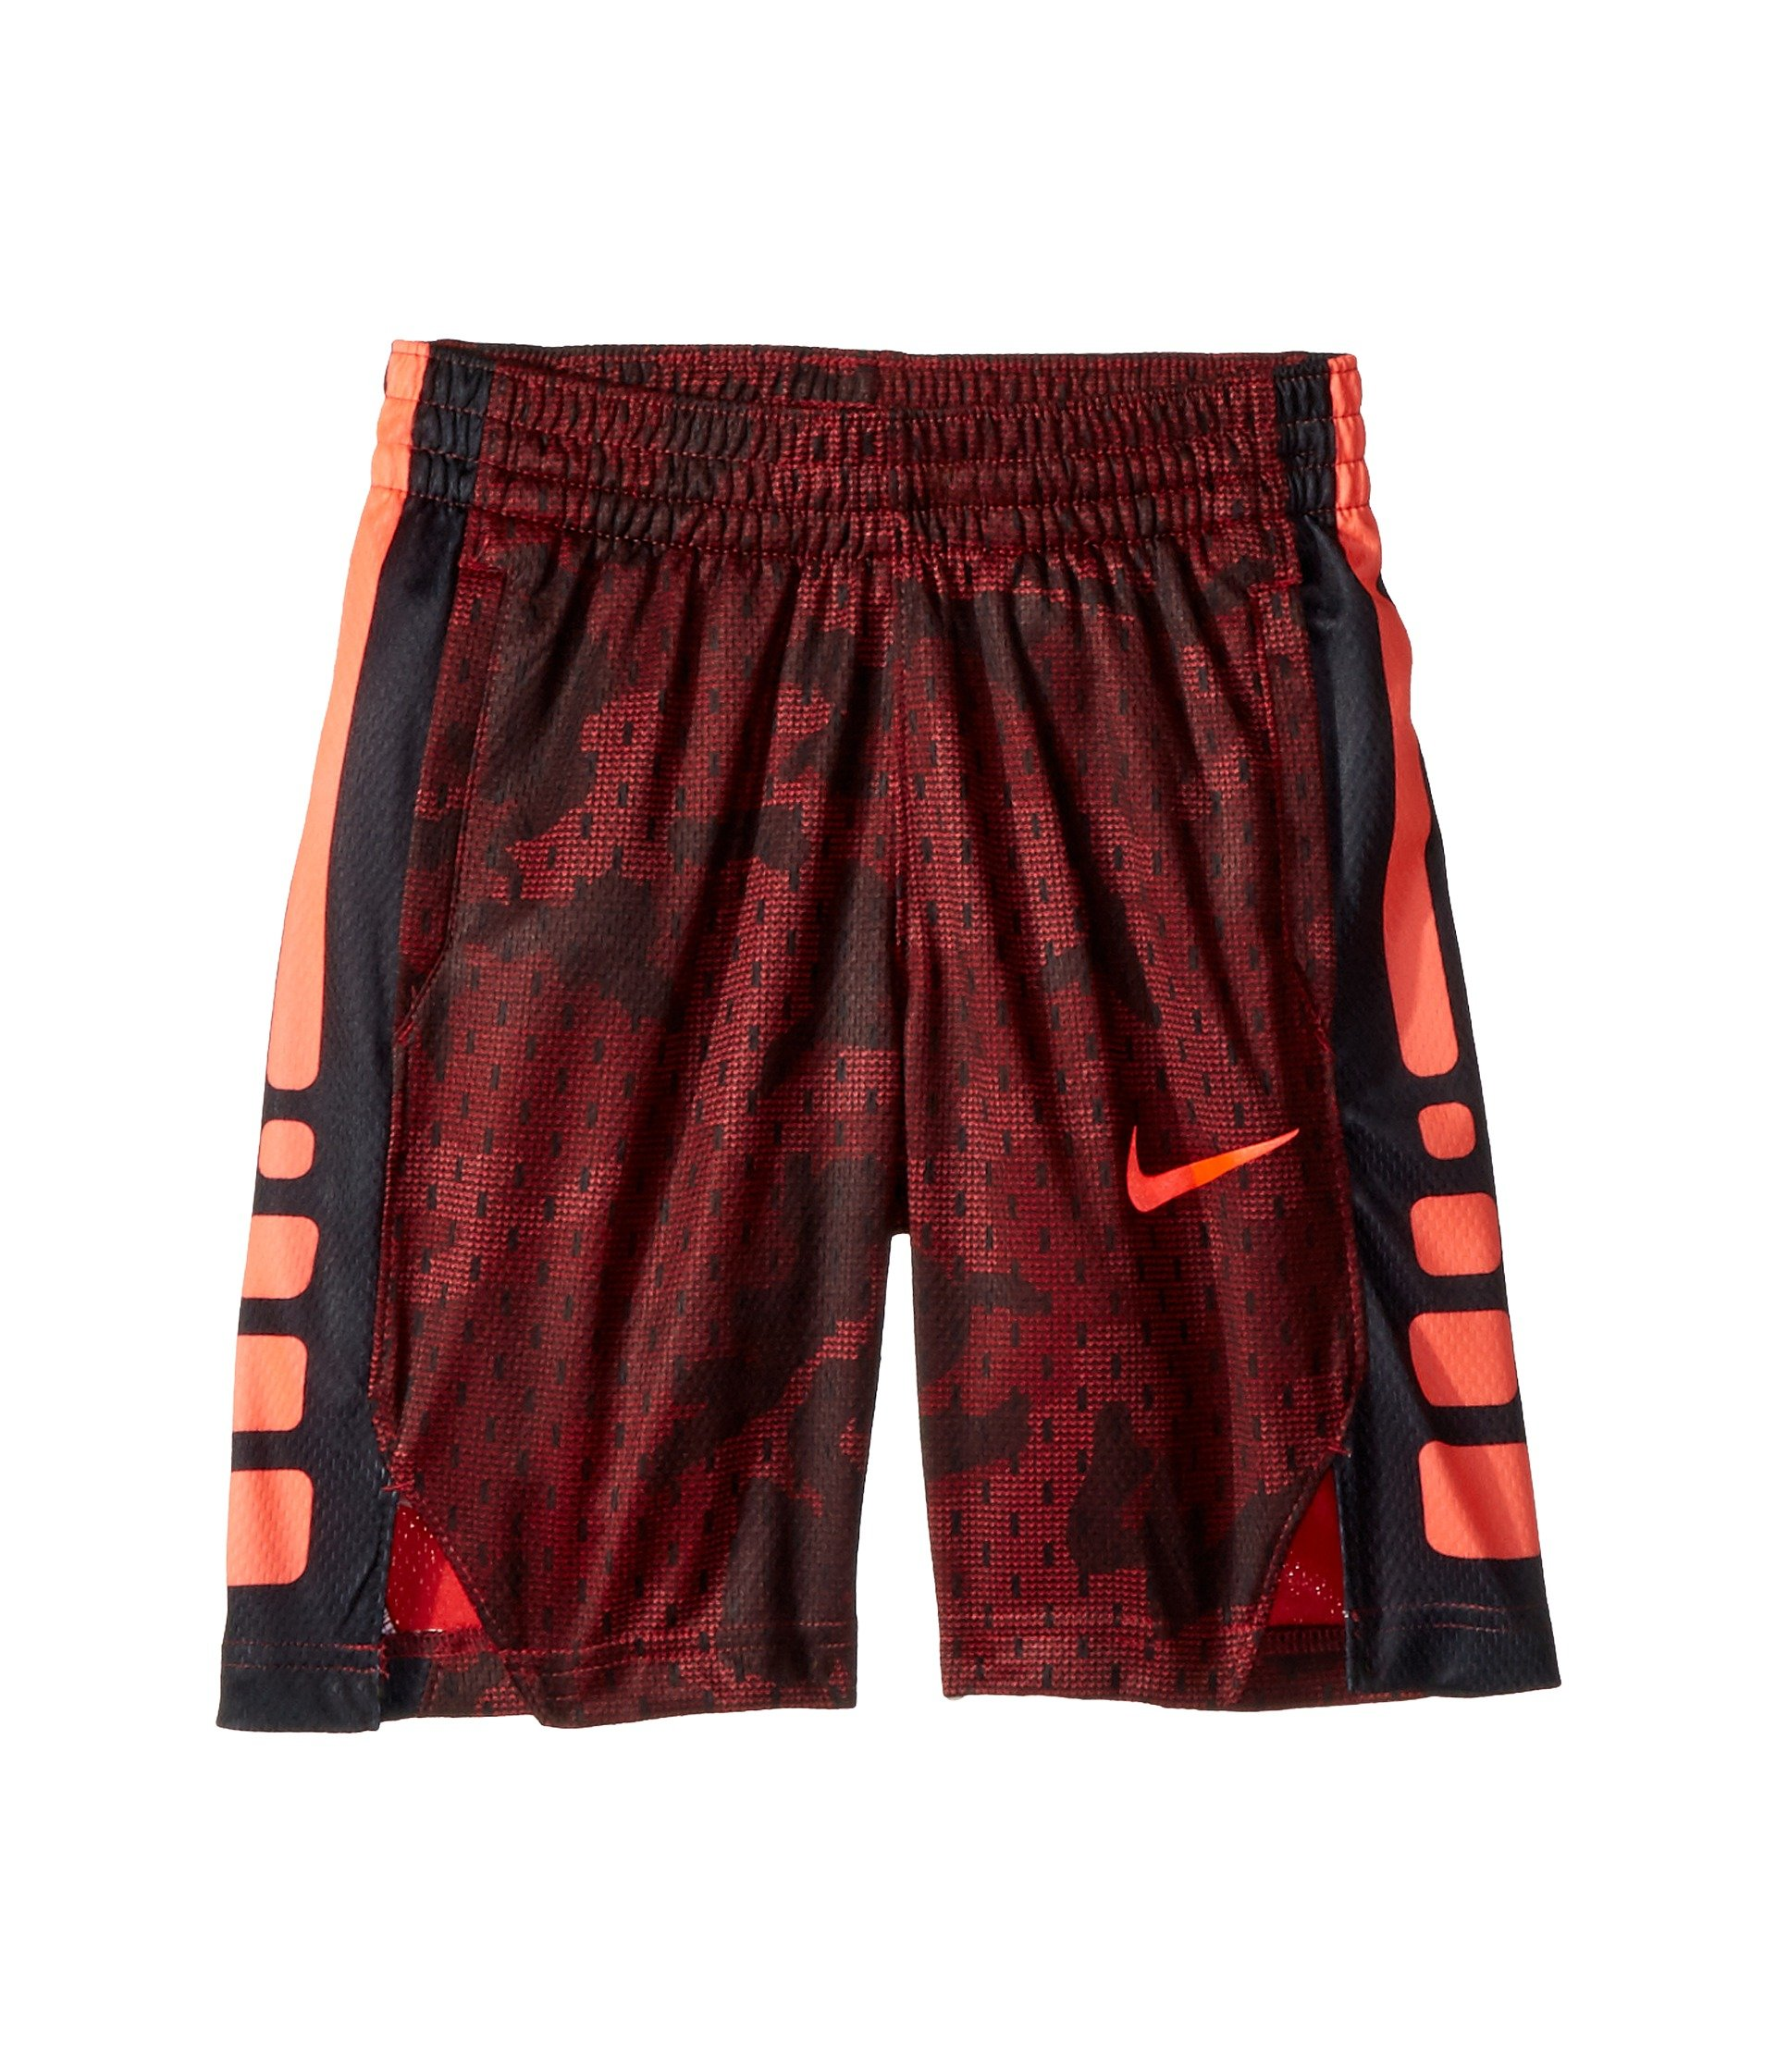 NIKE Boy's Dry Elite Camo Print Basketball Shorts (Red Crush/Black, Small) by Nike